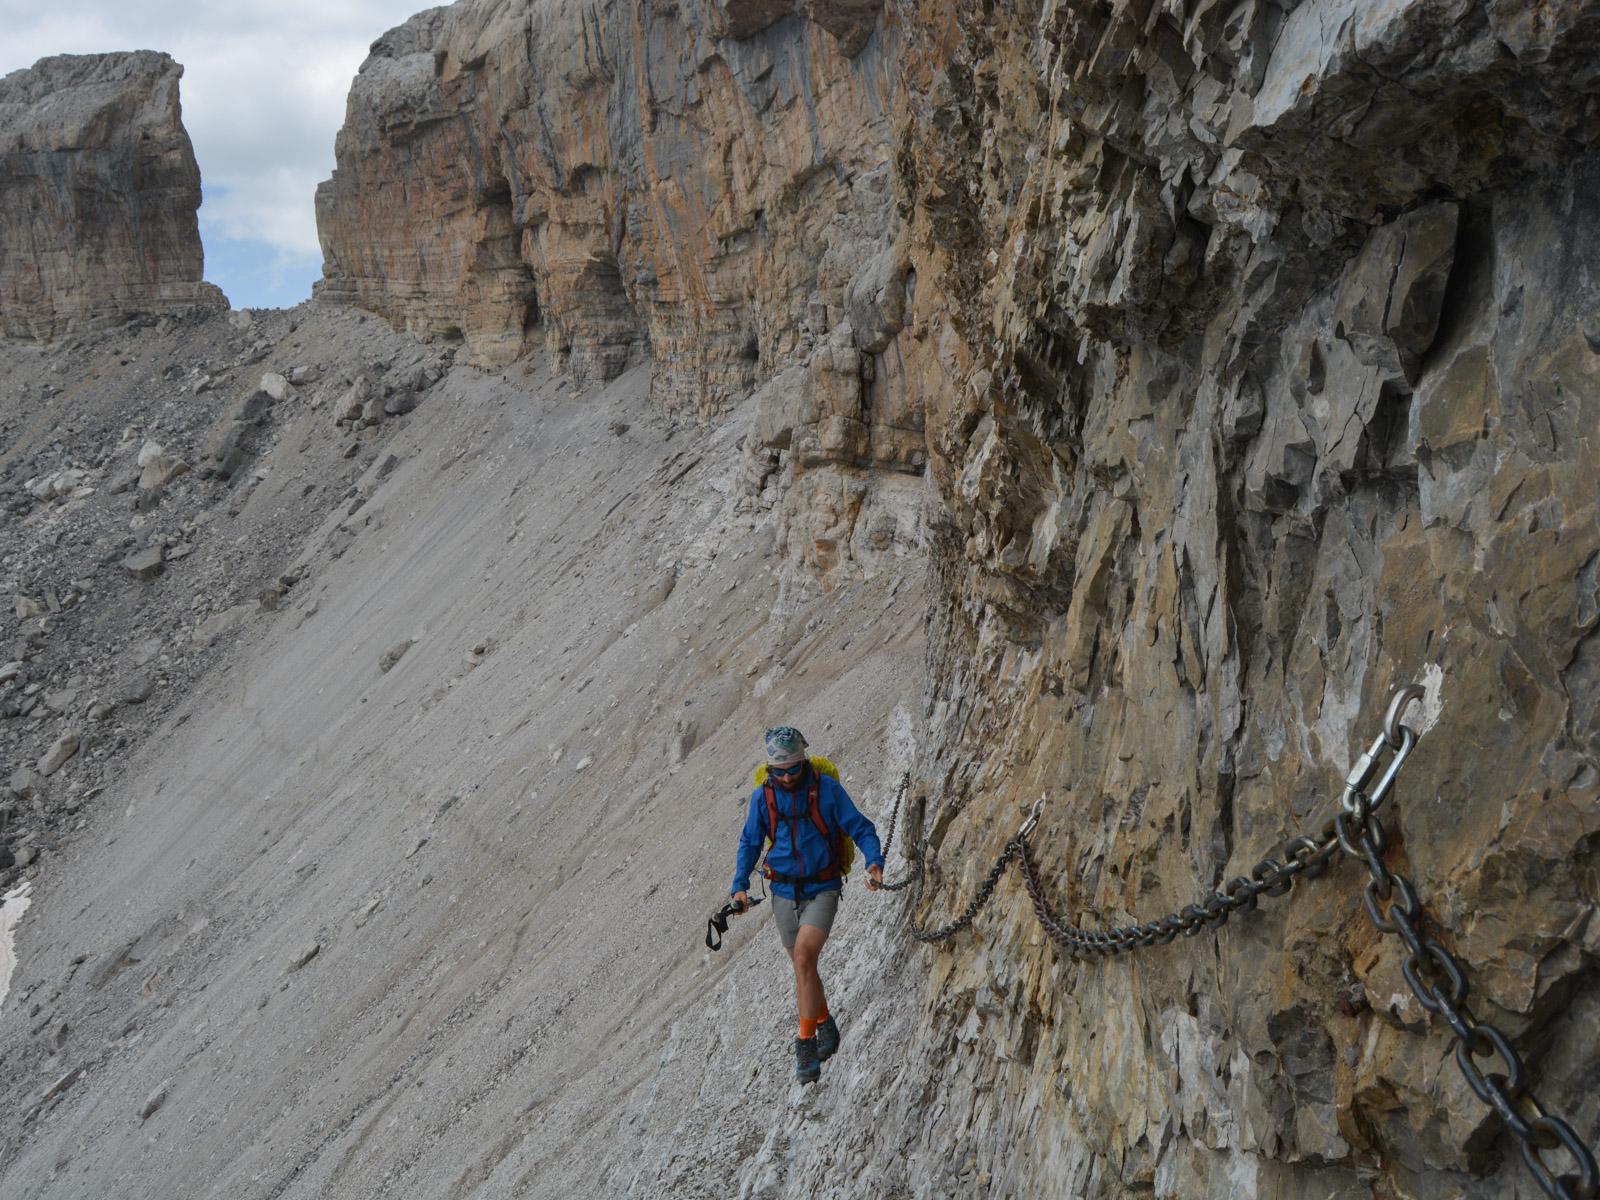 Monte Perdido et Faja de las Flores, Jour 1, Ordesa, Aragon, Espagne 24